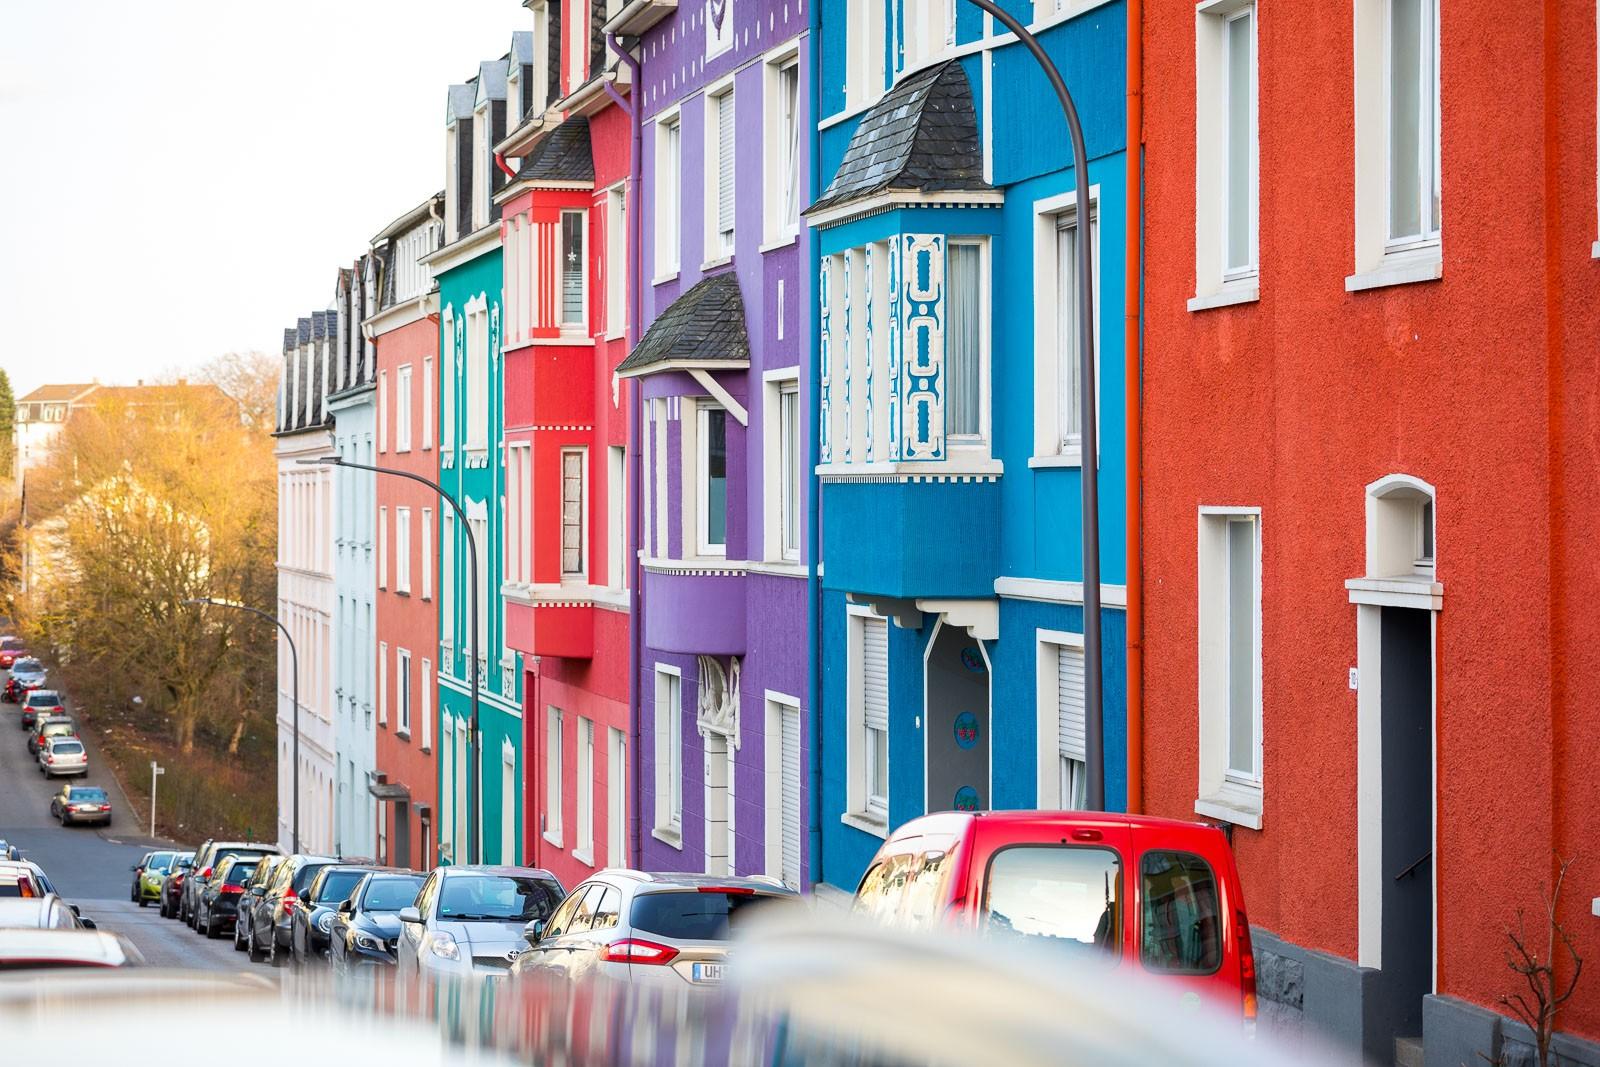 Bunte Häuser in Wuppertal